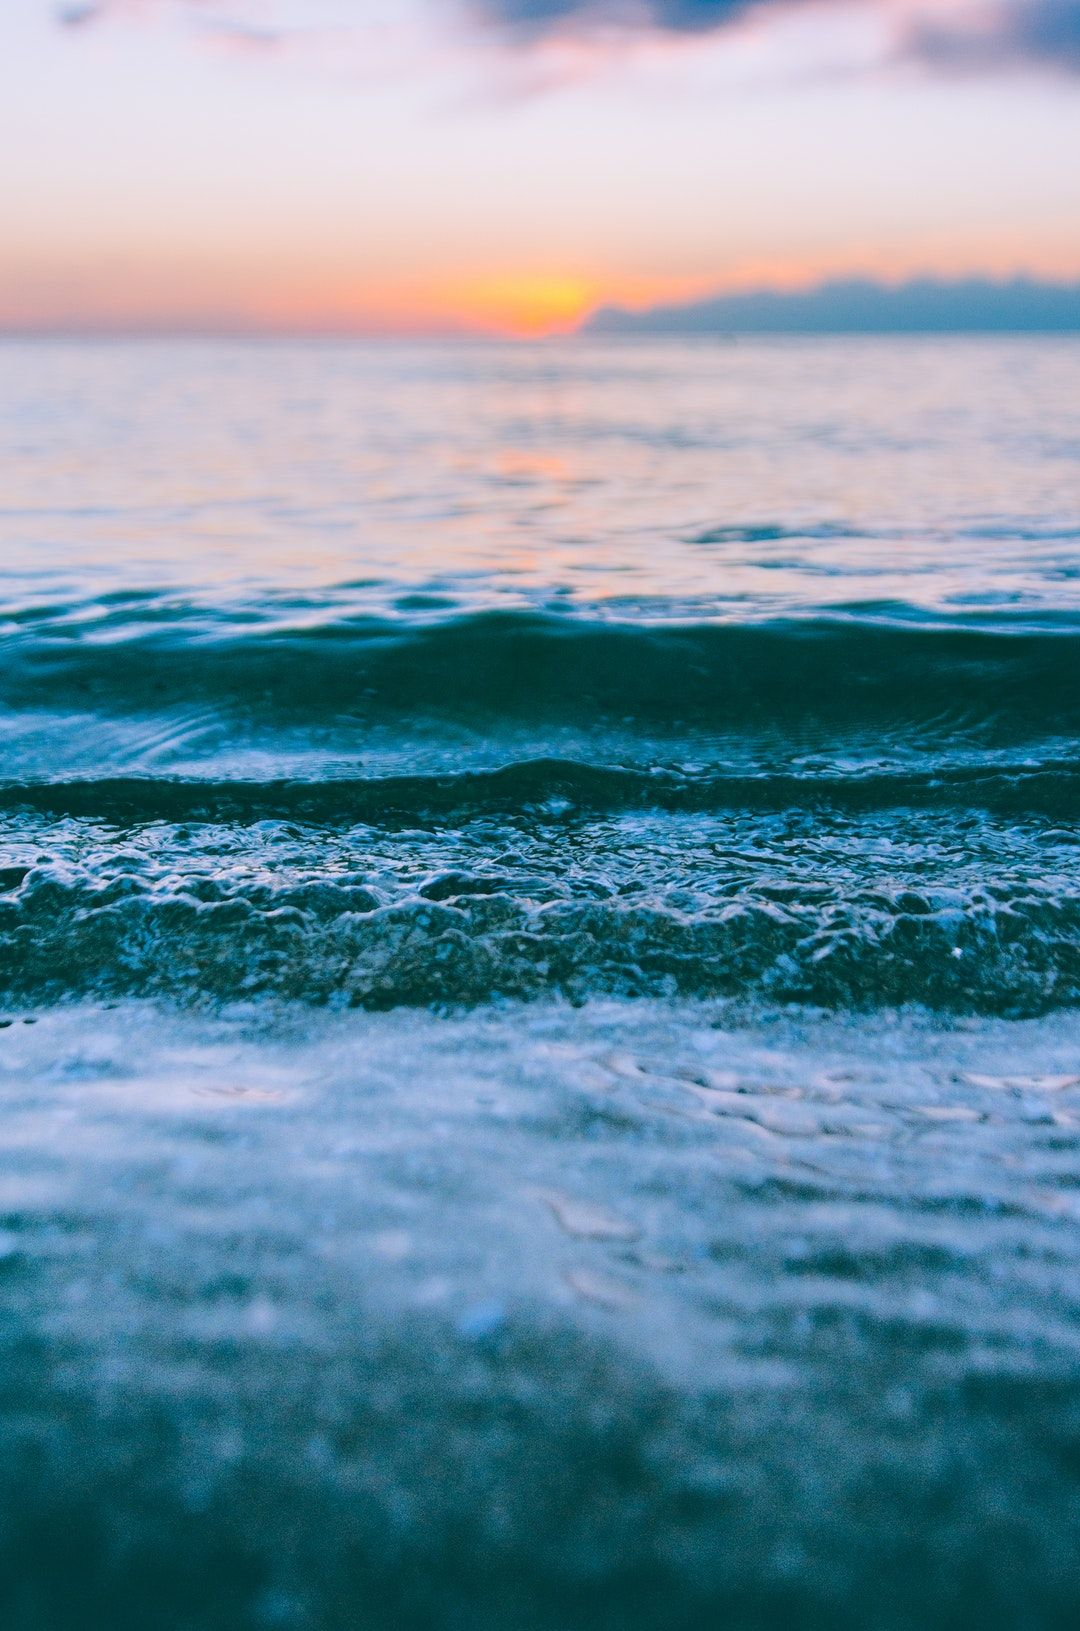 Water Ocean Sea And Nature Hd Photo By Linda Xu Rhindaxu On Unsplash Iphone Wallpaper Ocean Beach Wallpaper Iphone Ocean Wallpaper